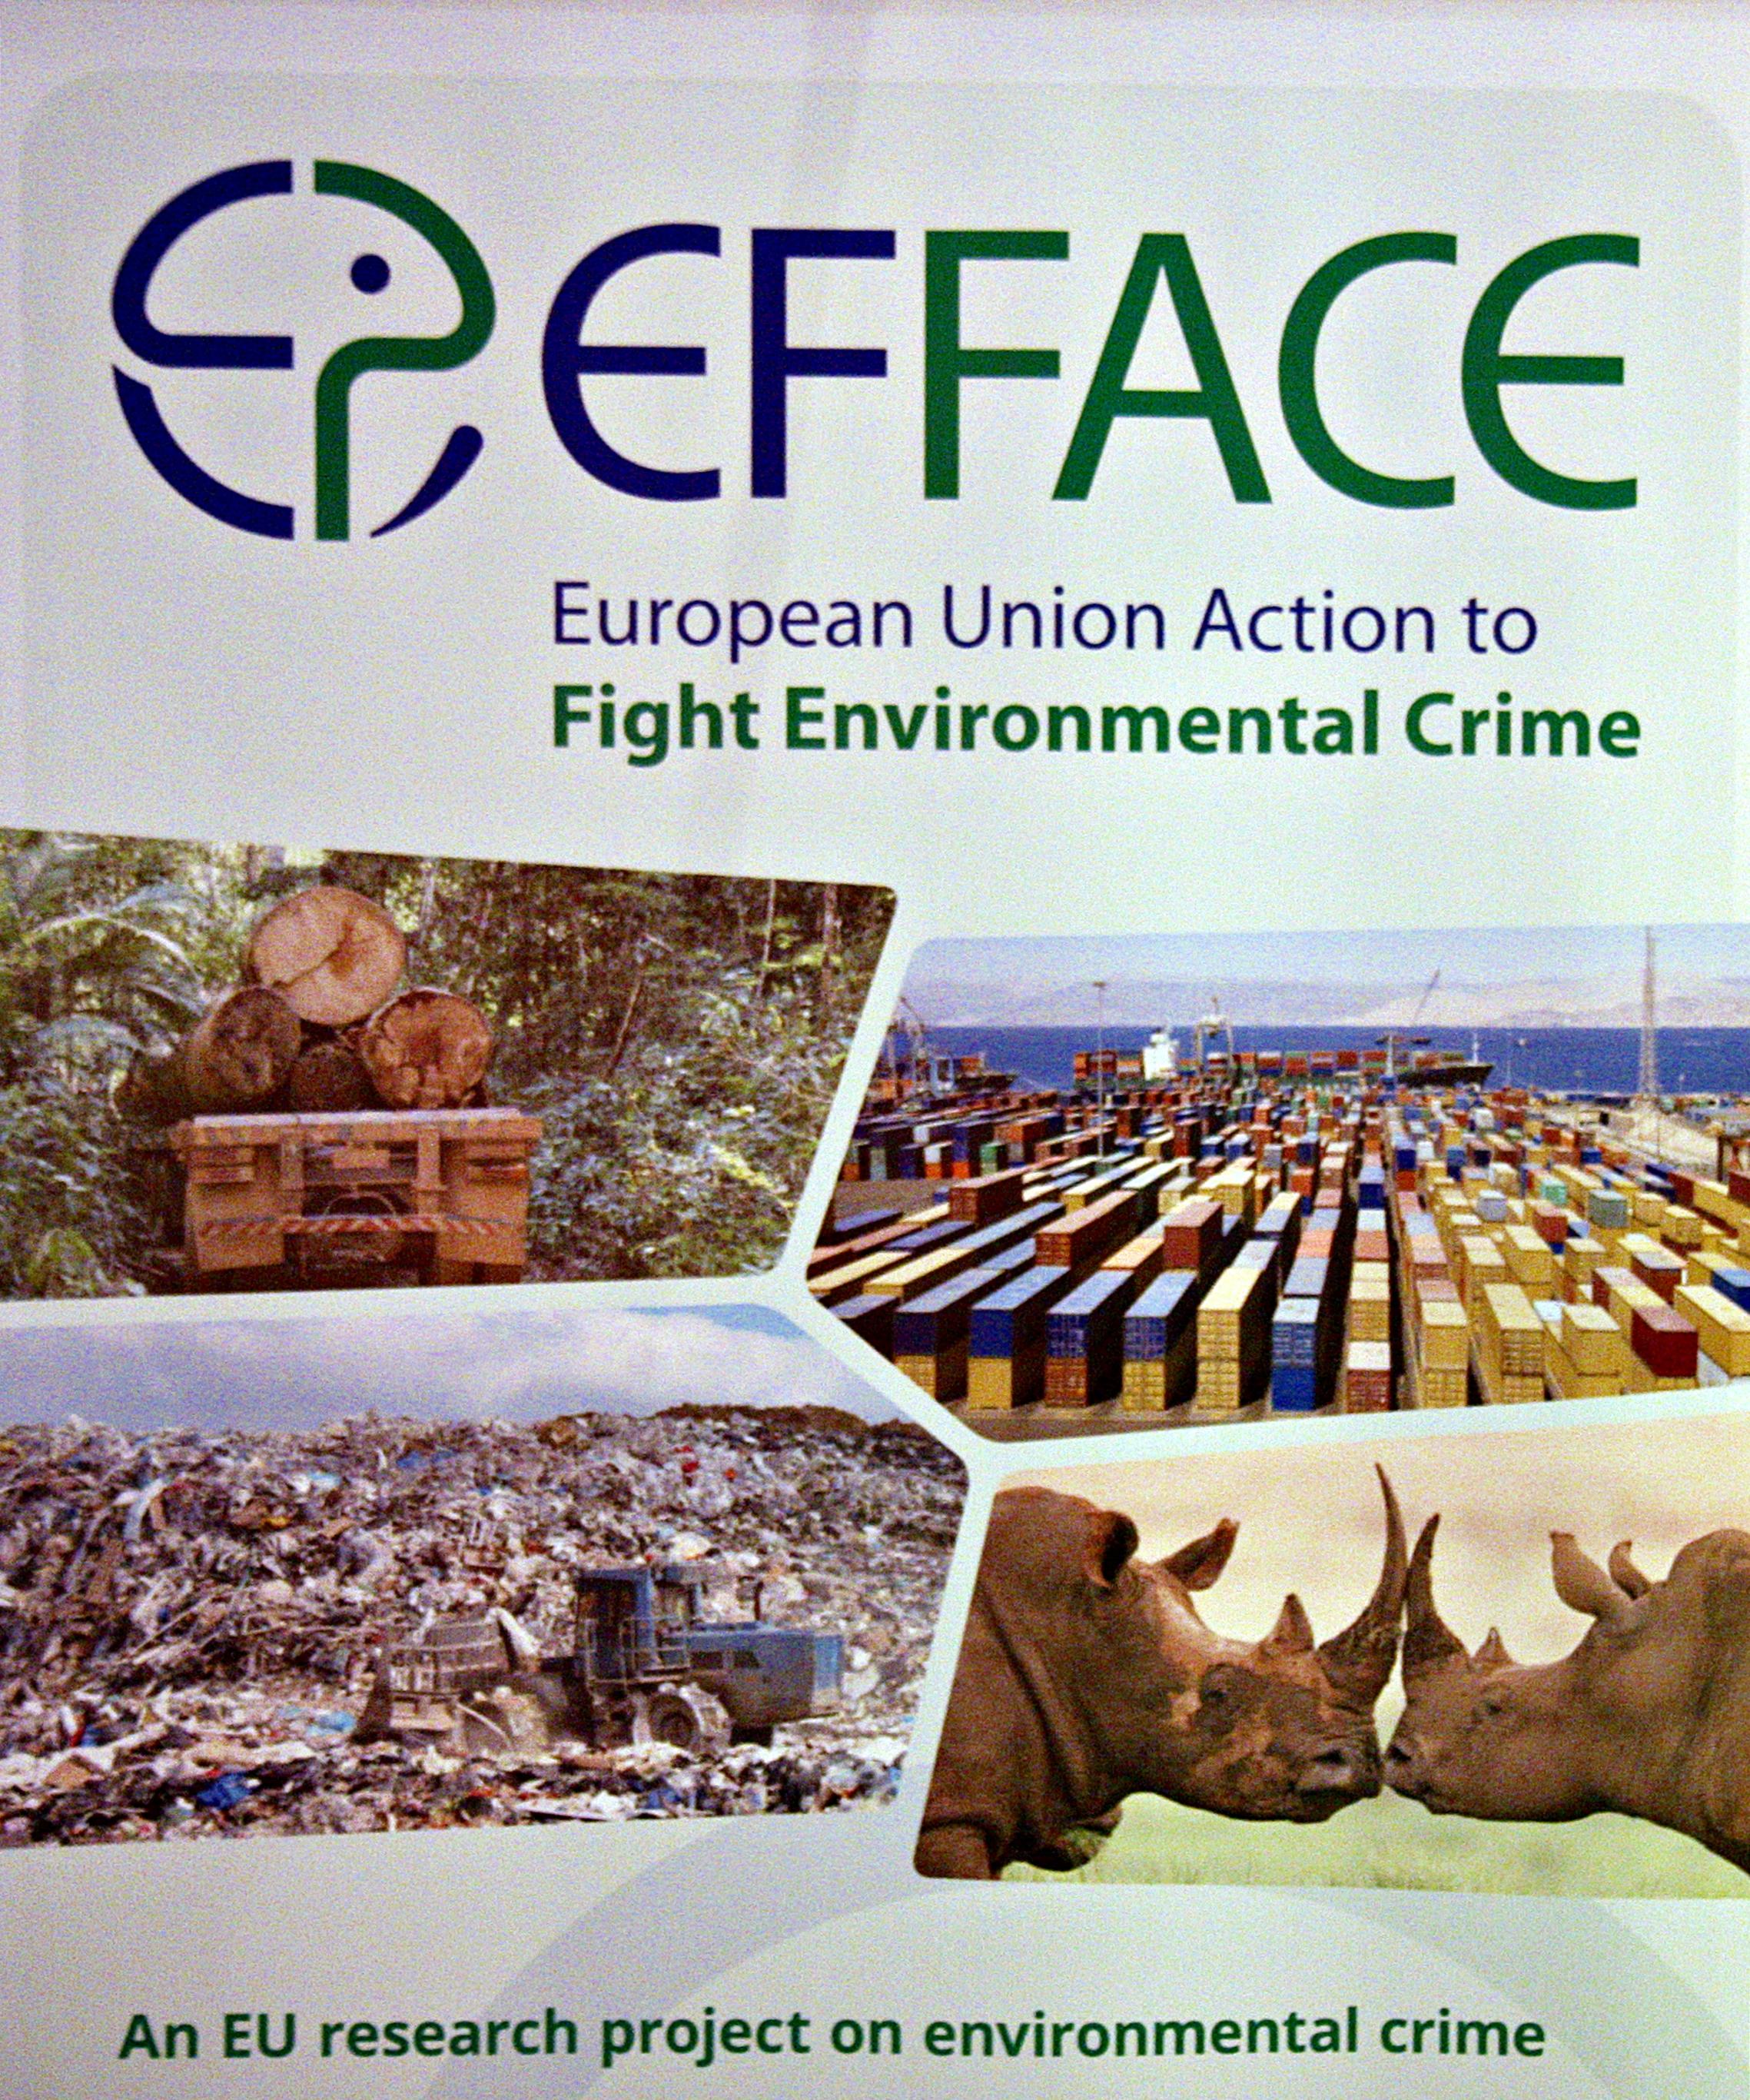 New taskforce to take action against violent crime